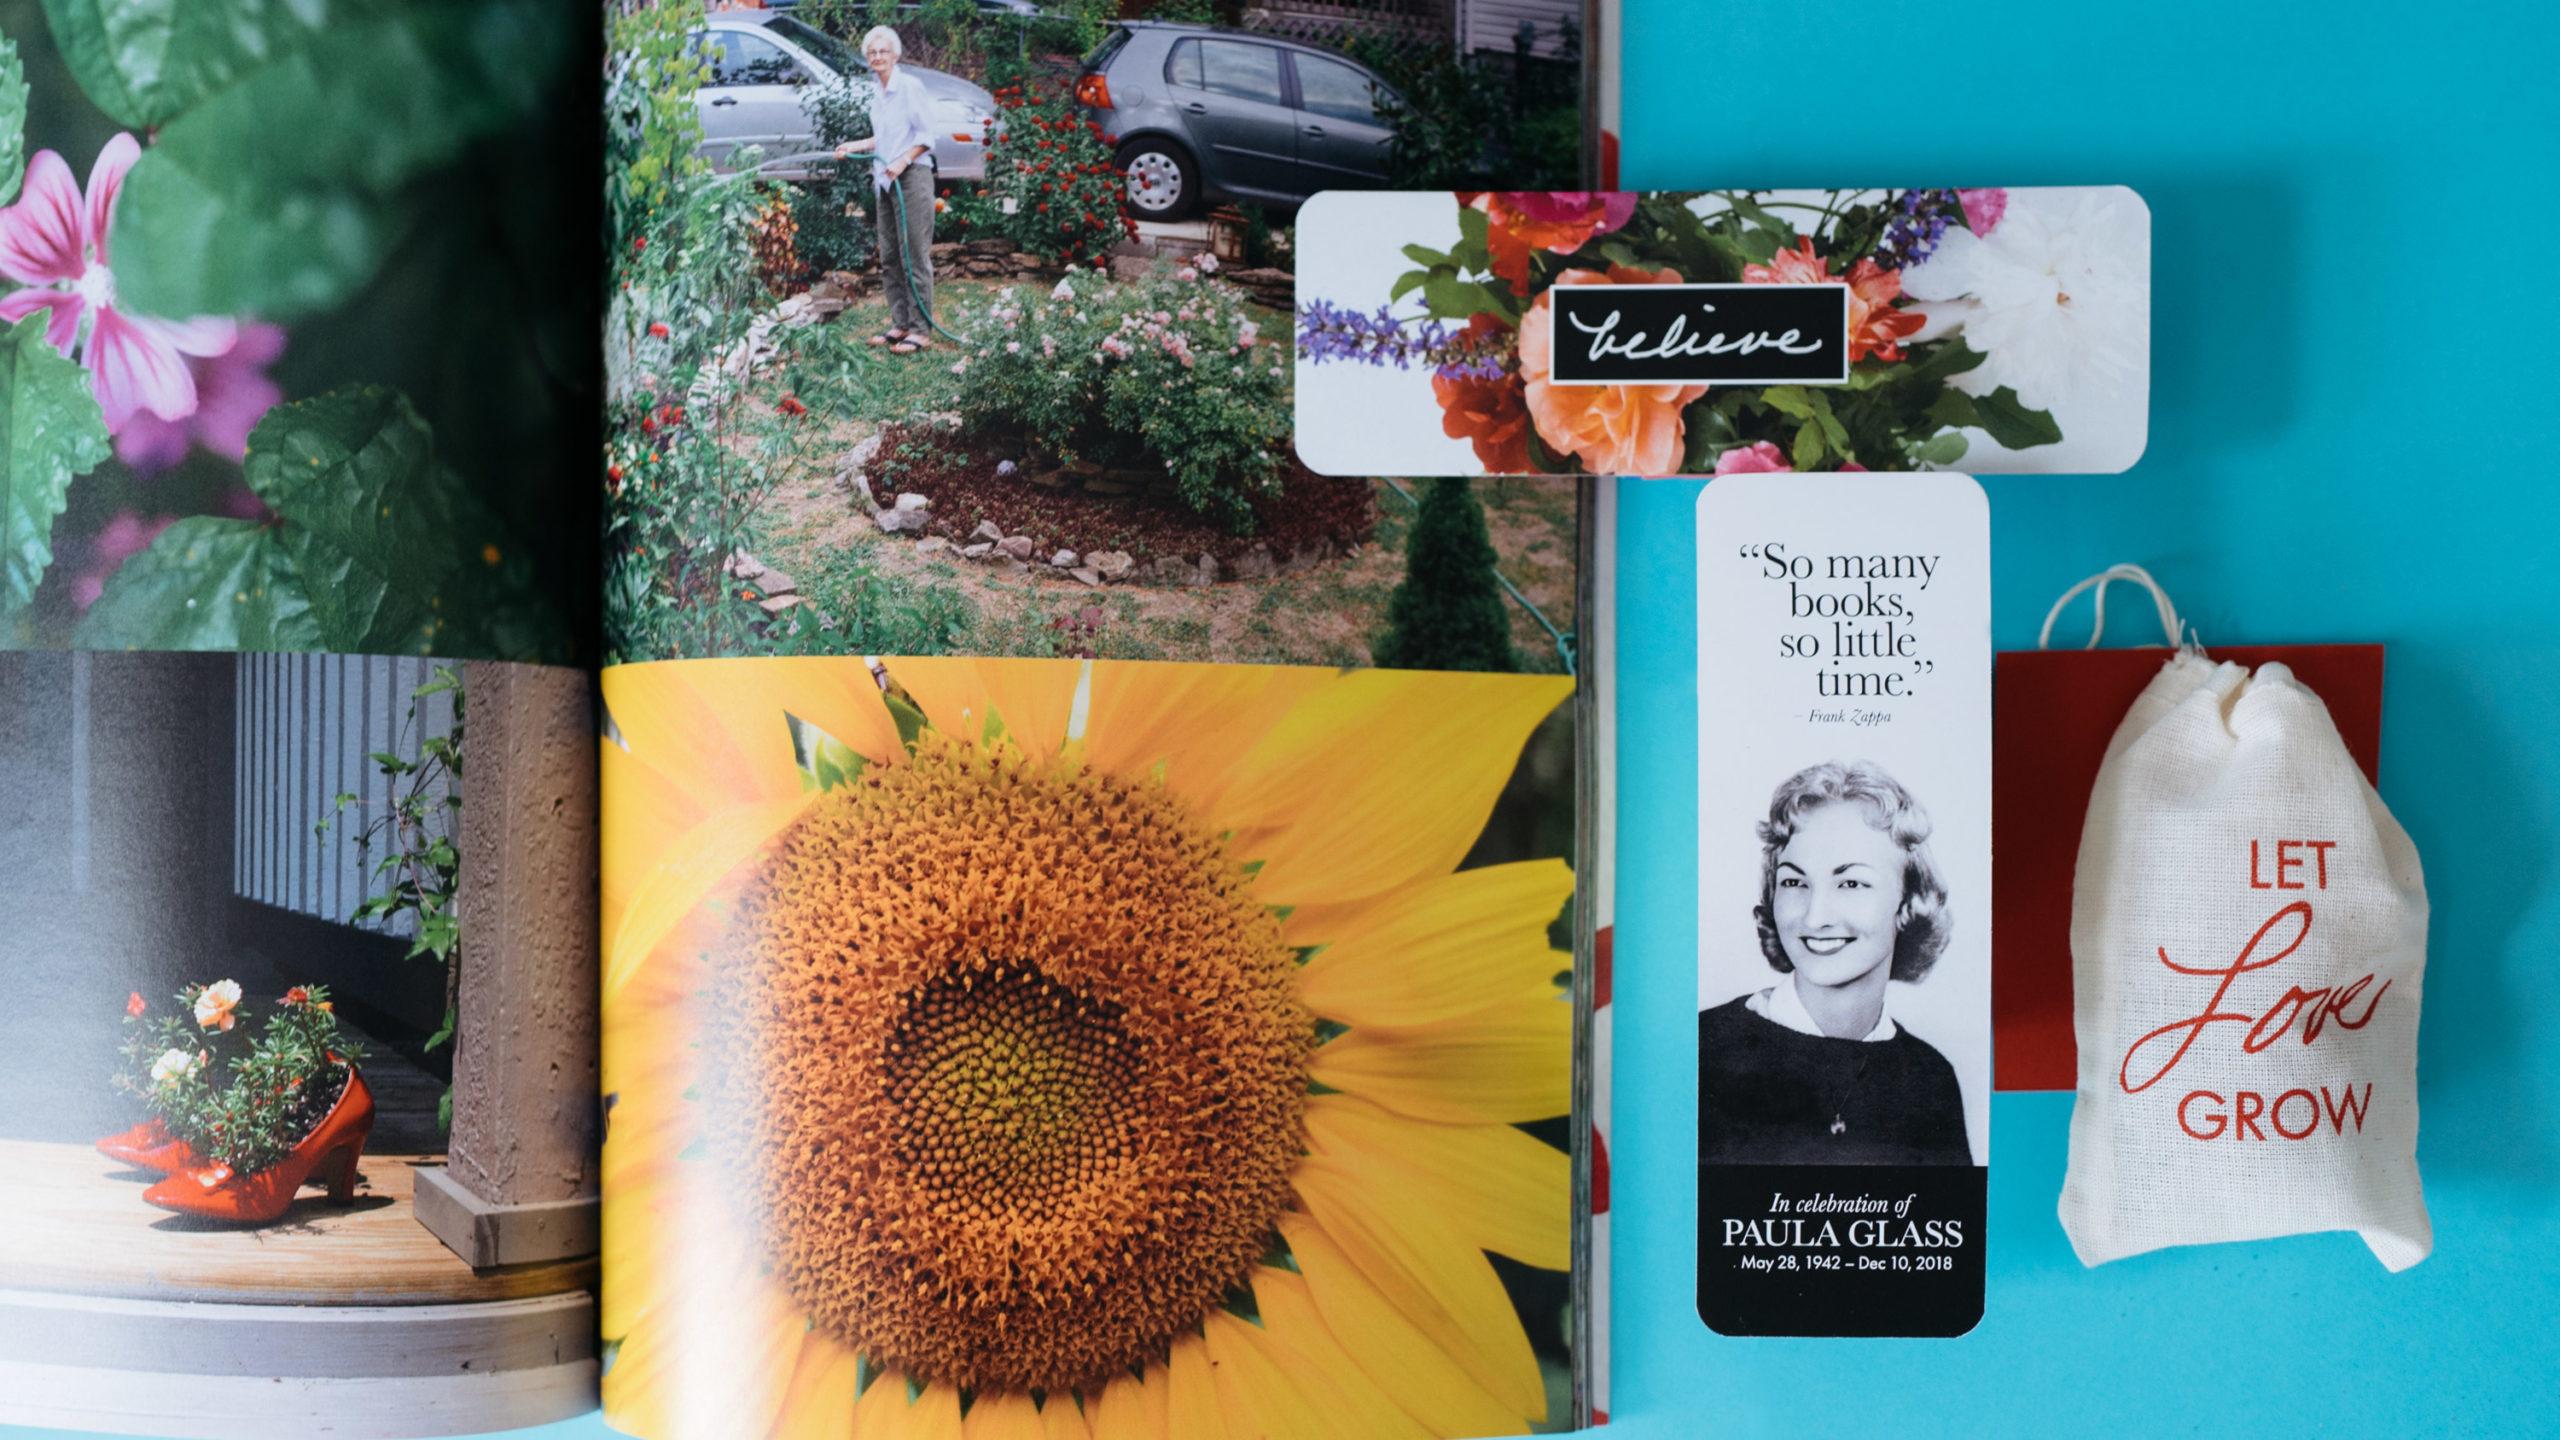 Mementos from a life celebration: a photo book, bookmark, seeds